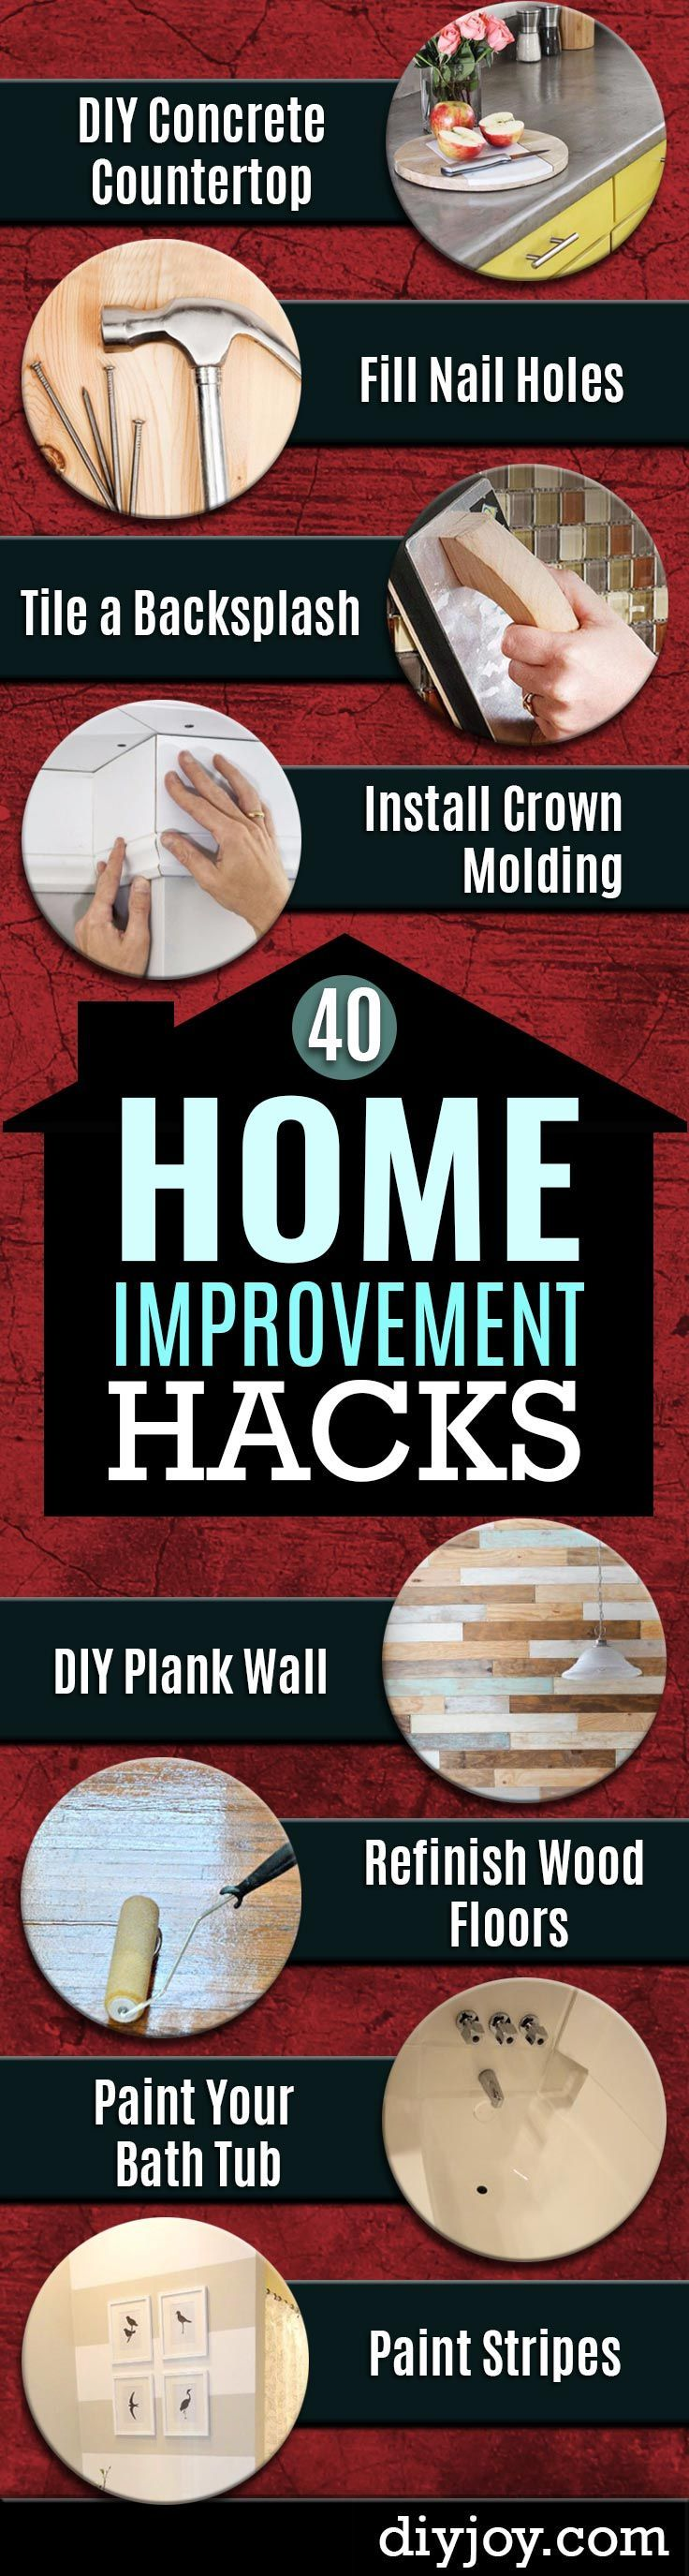 cool 41 Clever Home Improvement Hacks - DIY Joy by http://www.danaz-home-decor-ideas.xyz/home-improvement/41-clever-home-improvement-hacks-diy-joy-4/